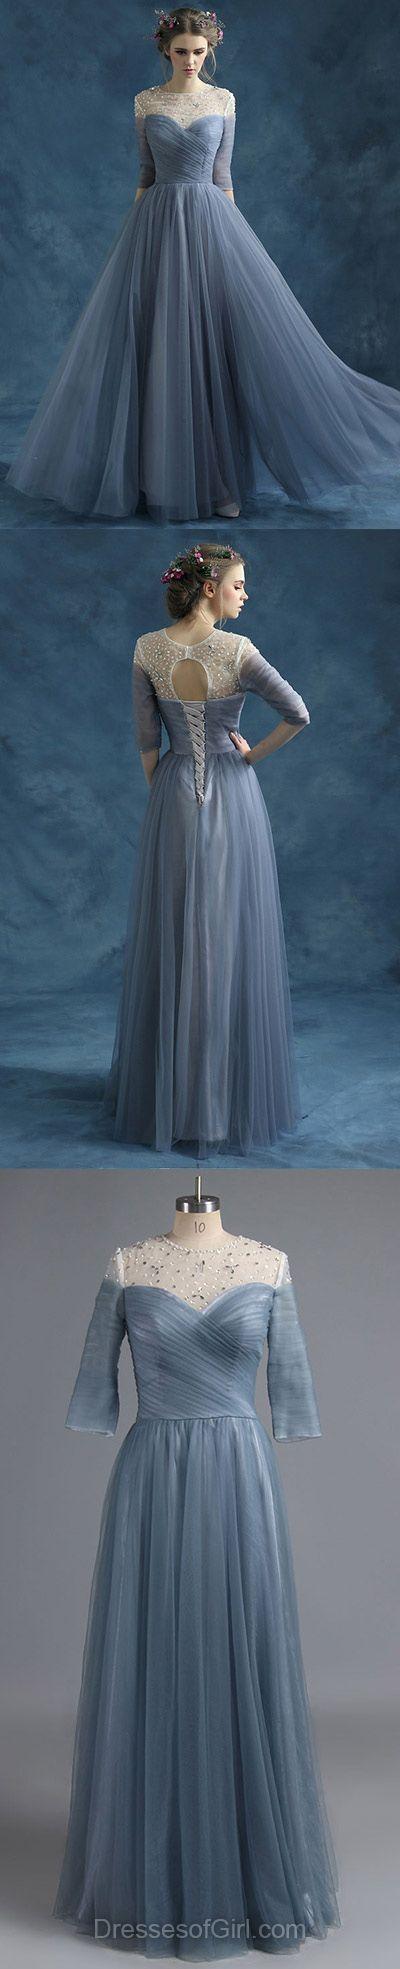 best elegant dresses images on pinterest party wear dresses